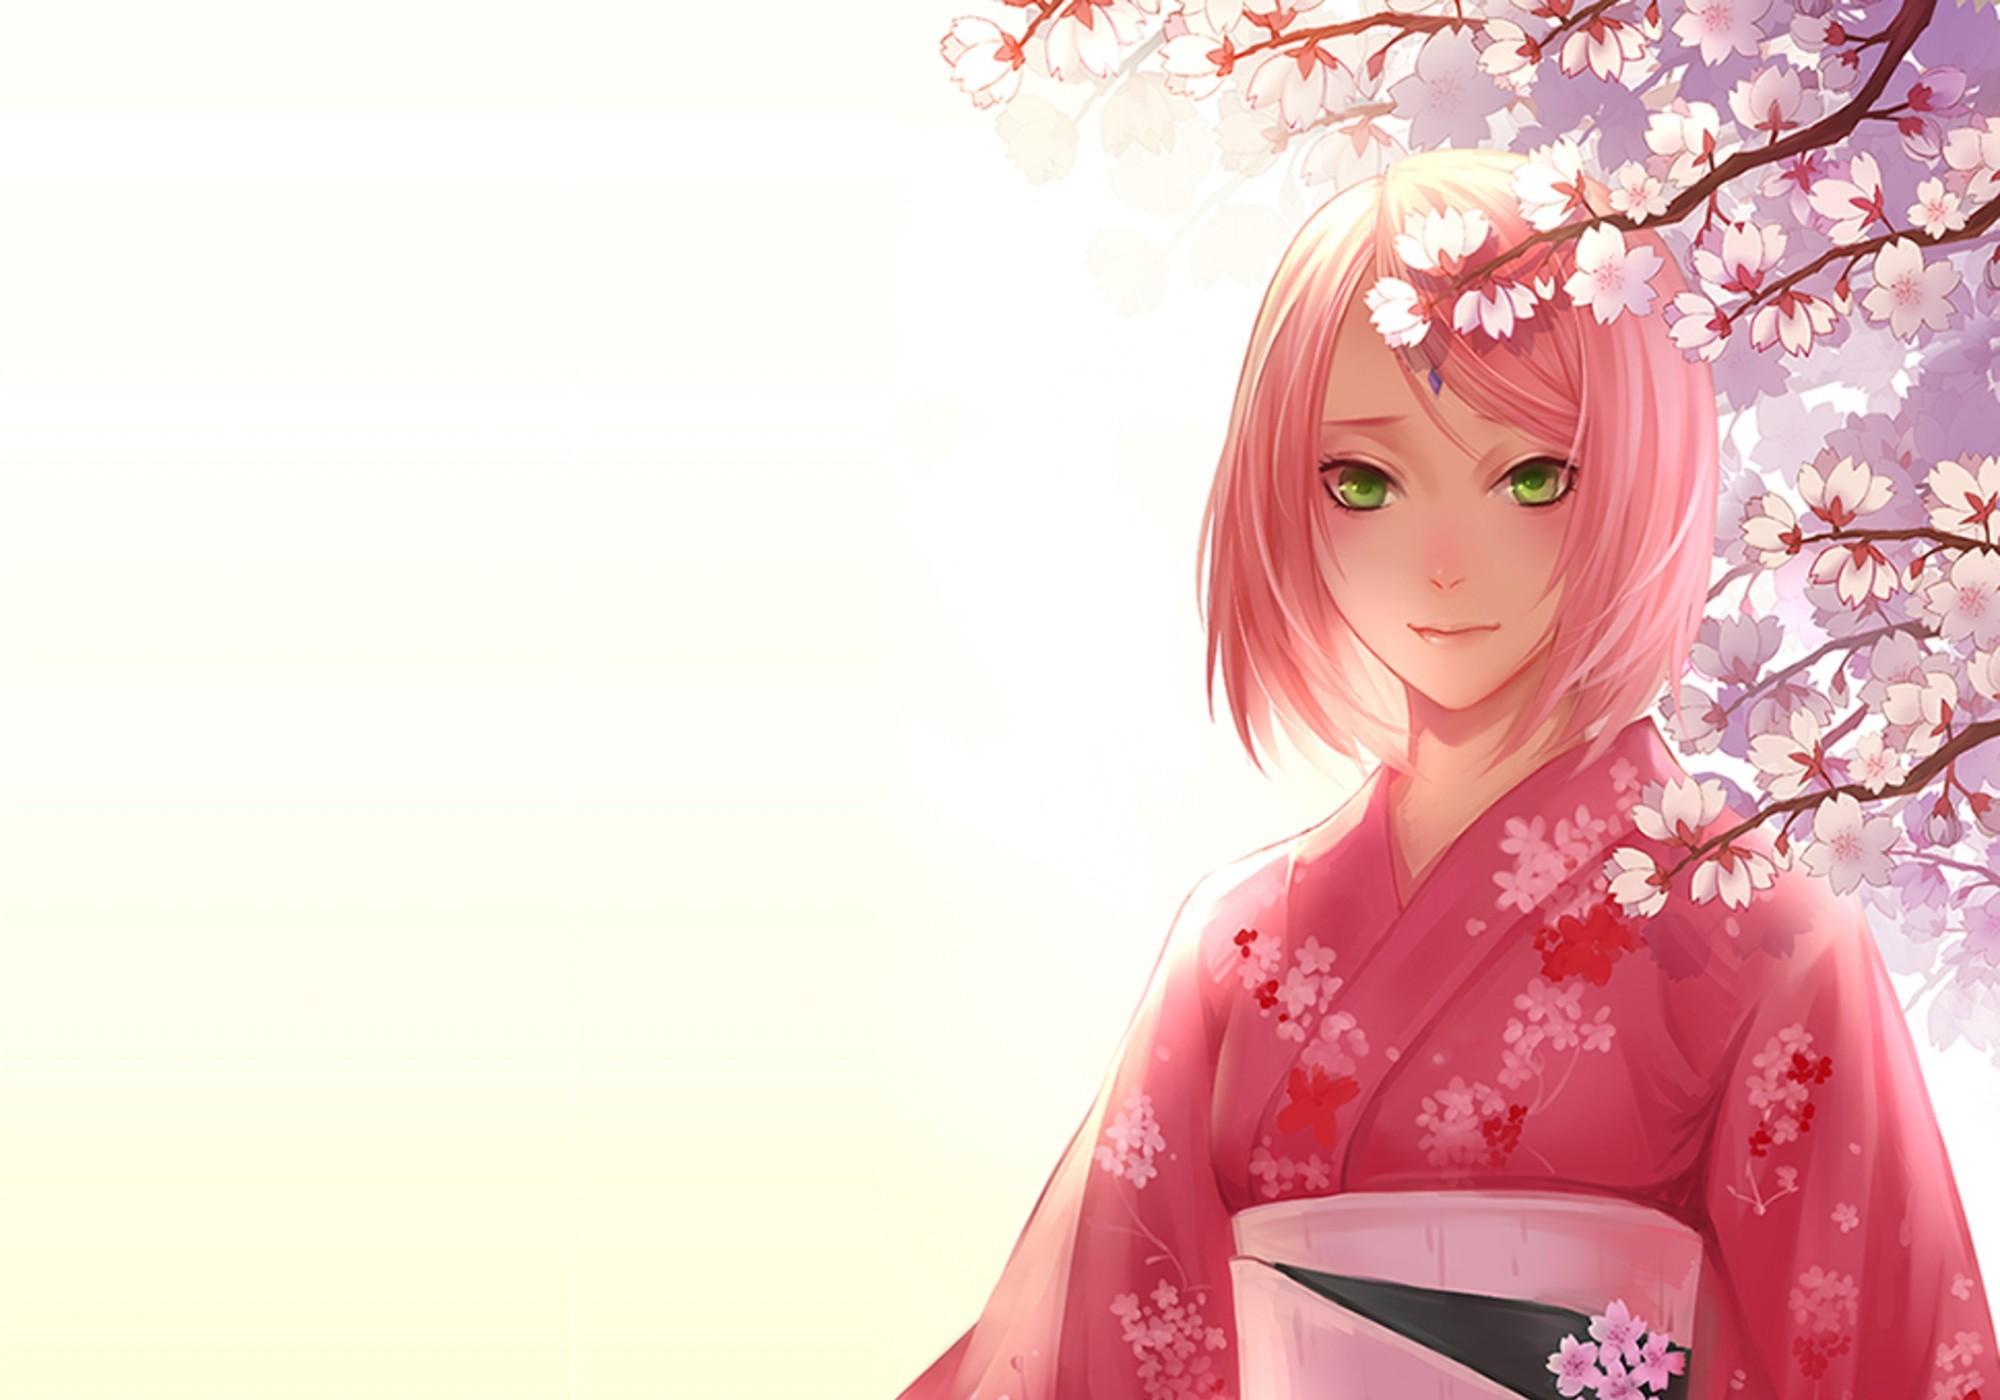 sakura wallpaper girls anime - photo #4